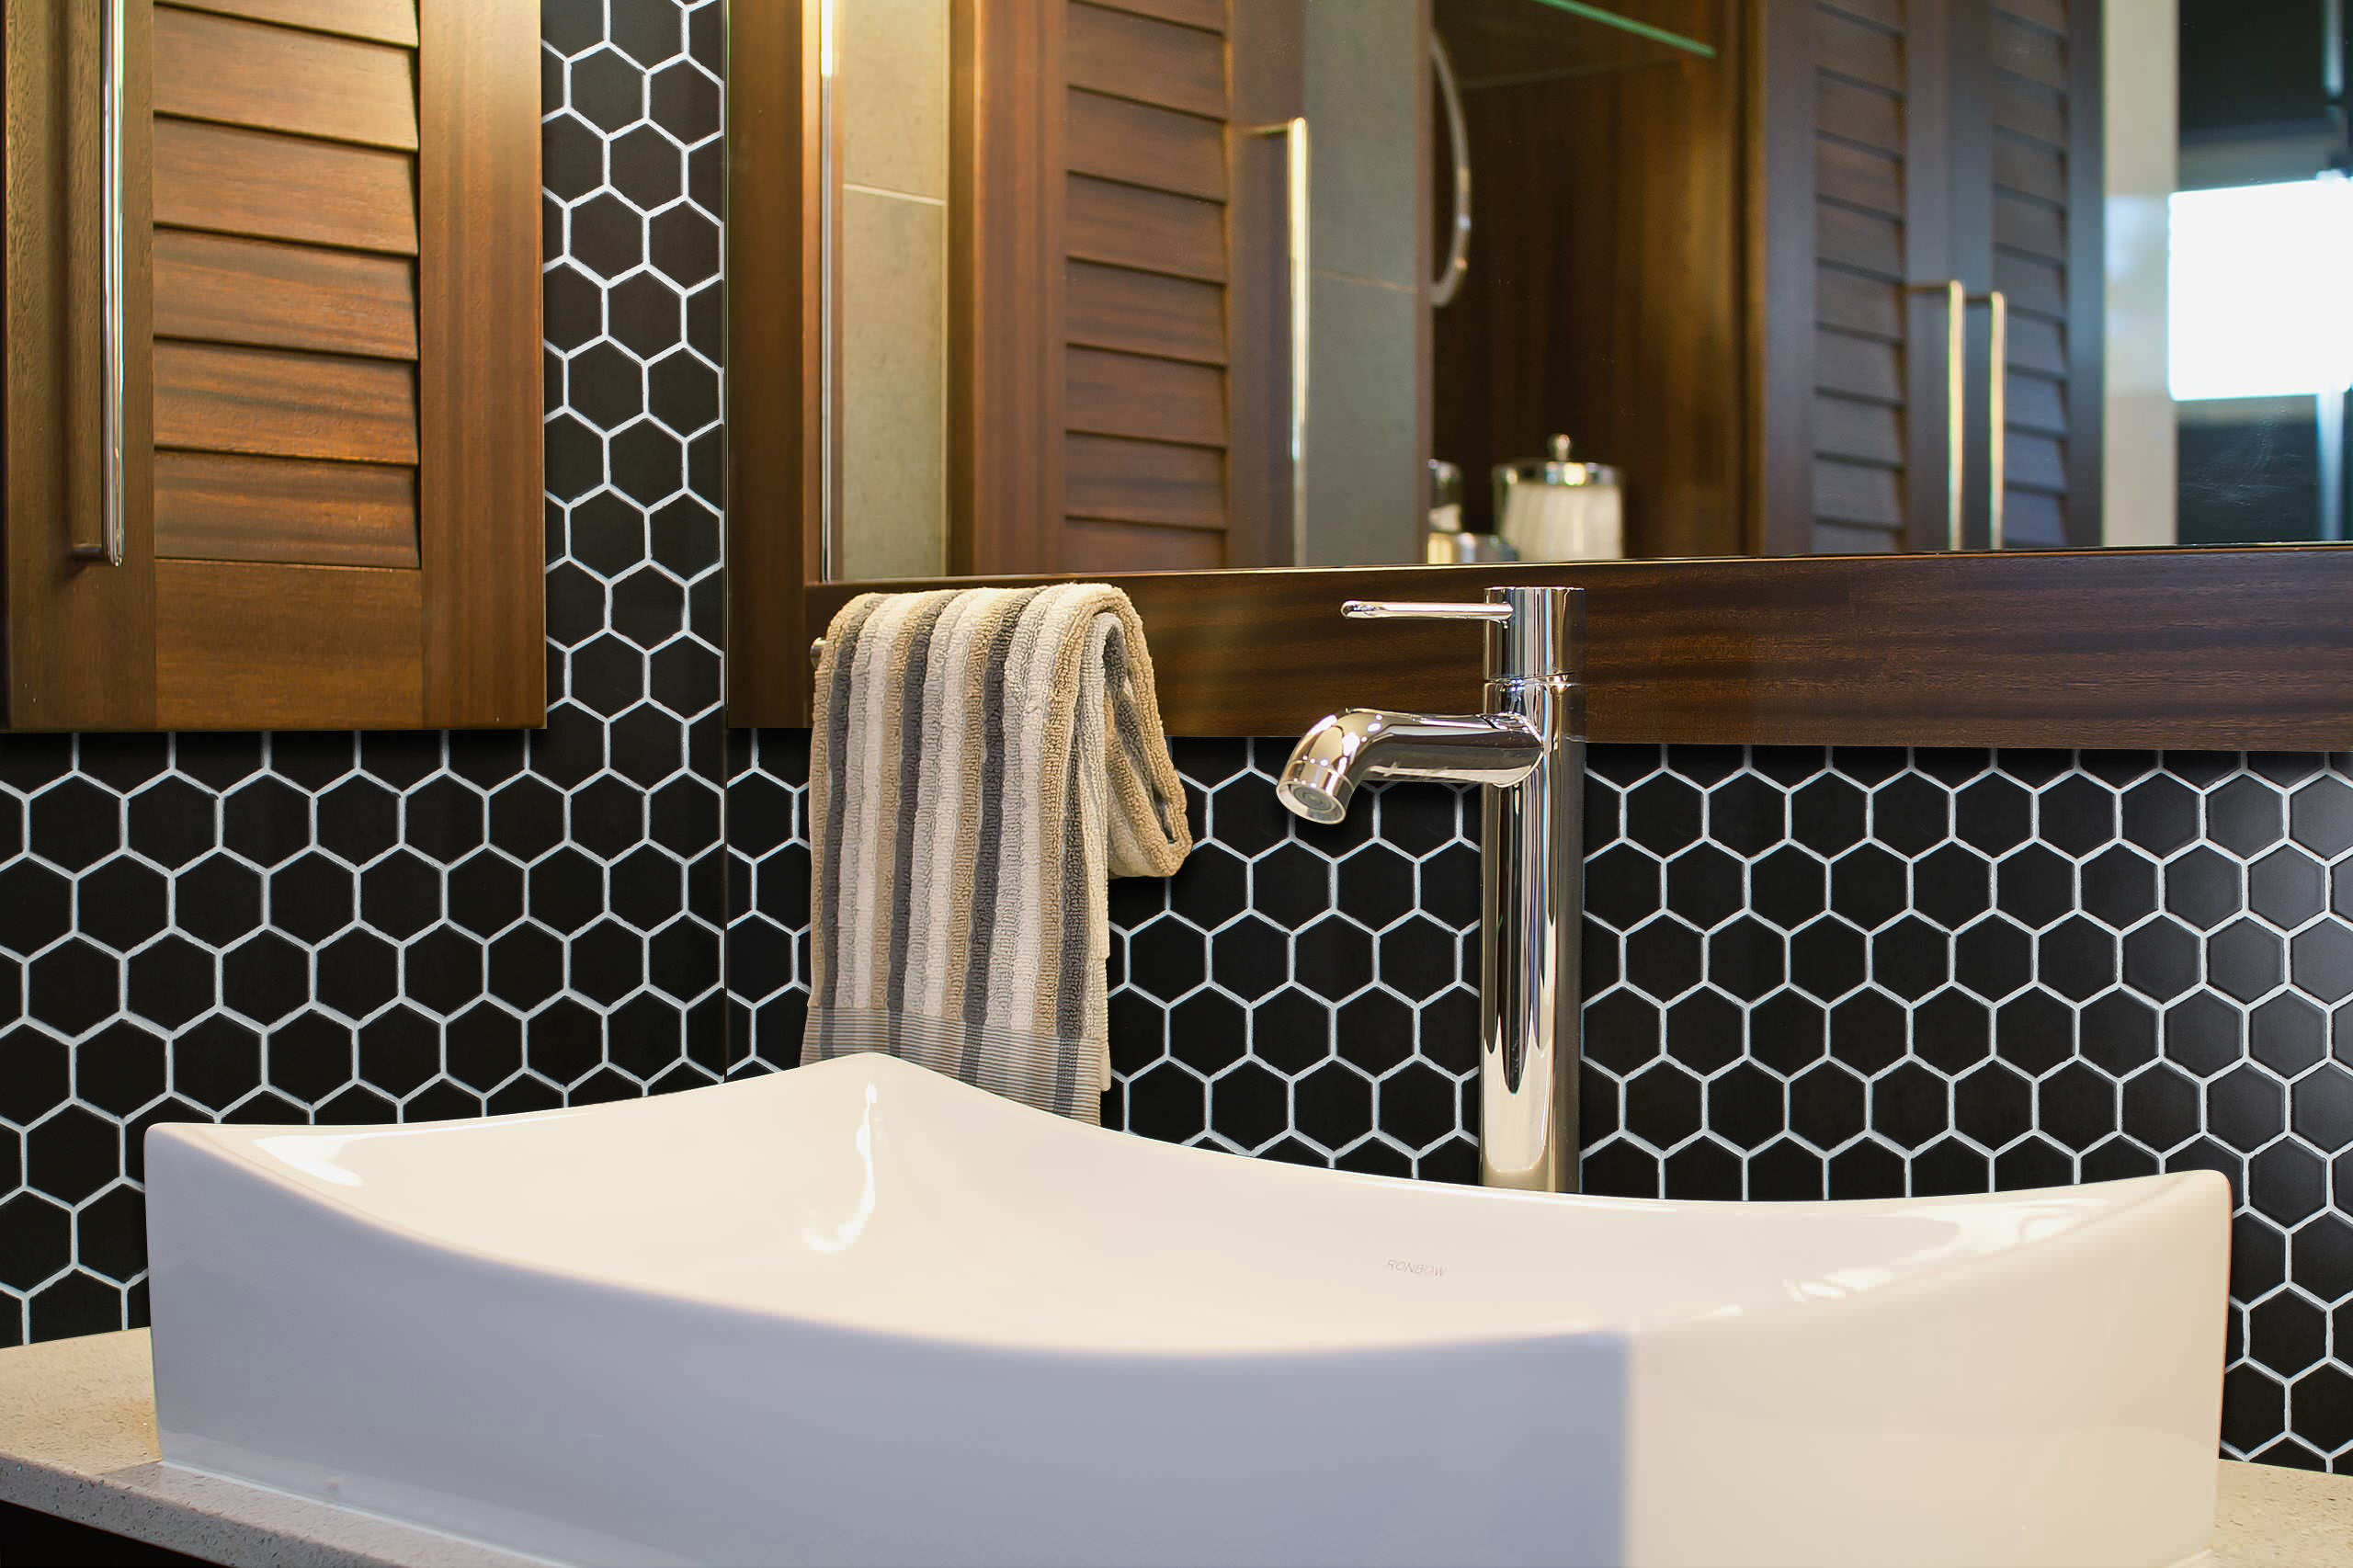 ws tiles value matte black 11 8 in x 10 2 in porcelain 1 hexagon mosaic floor wall tile 9 sq ft case